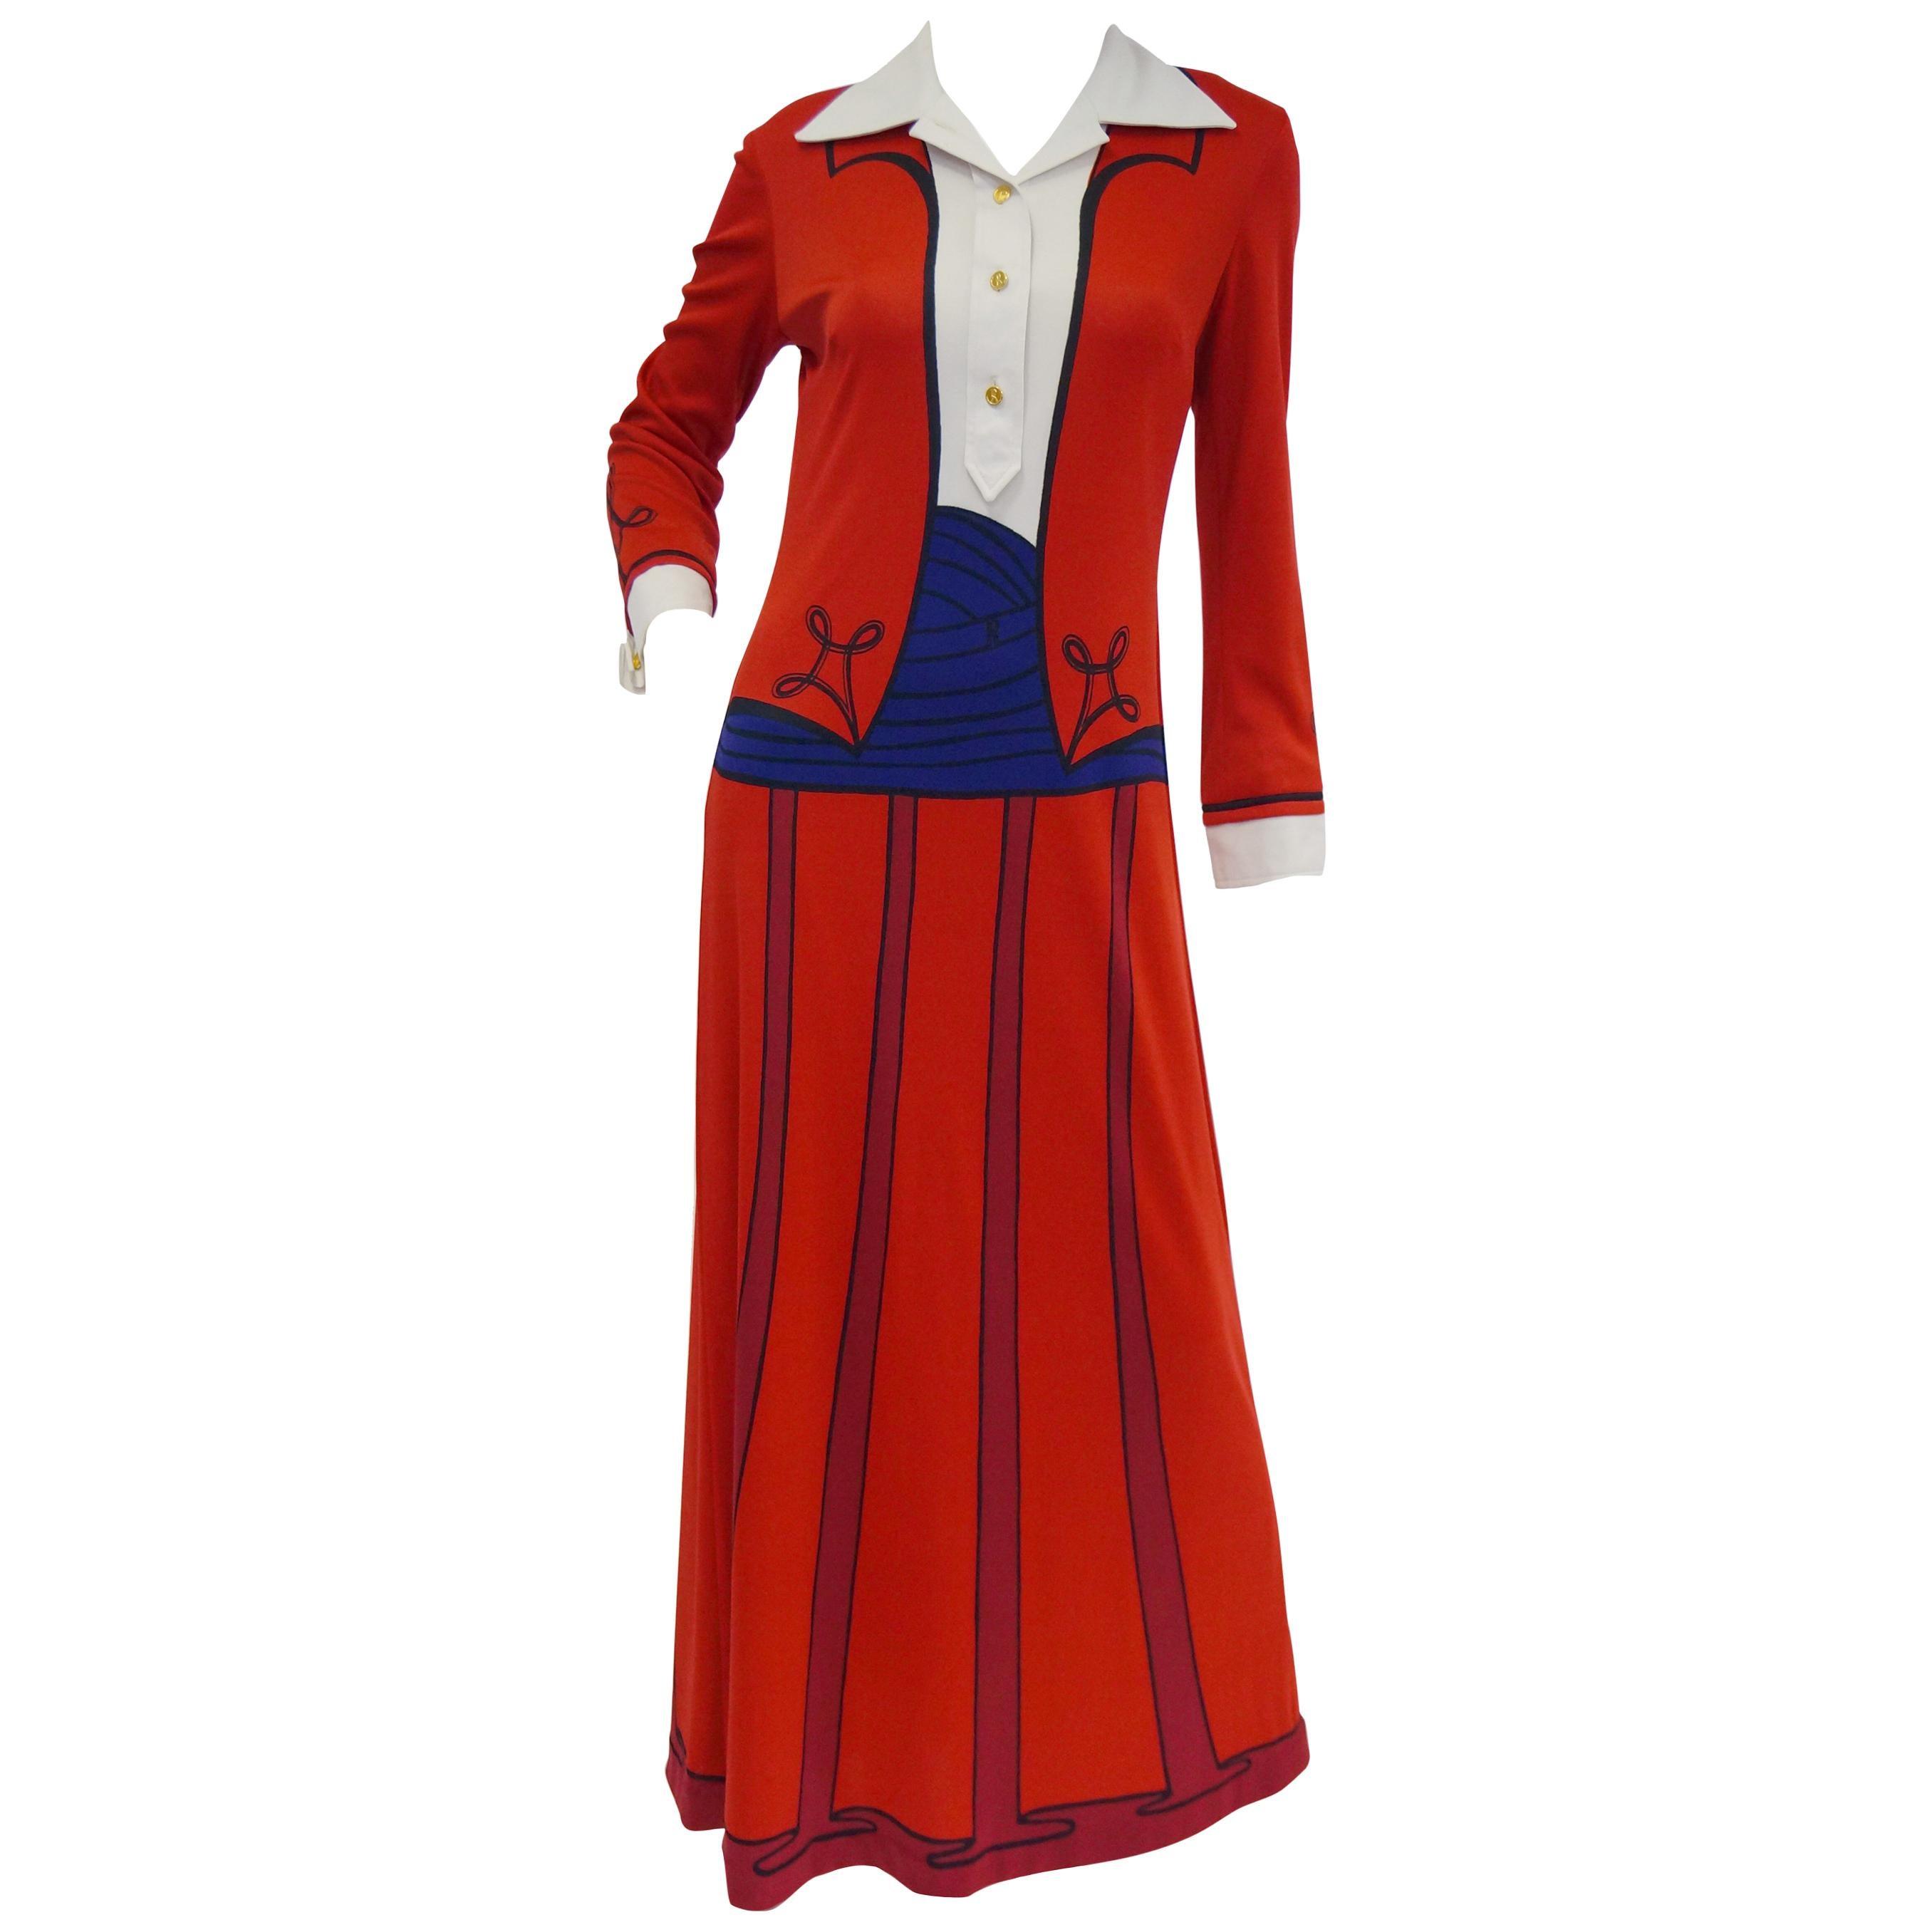 1970s Roberta di Camerino Red Tromple L'oeil Ensemble Maxi Dress